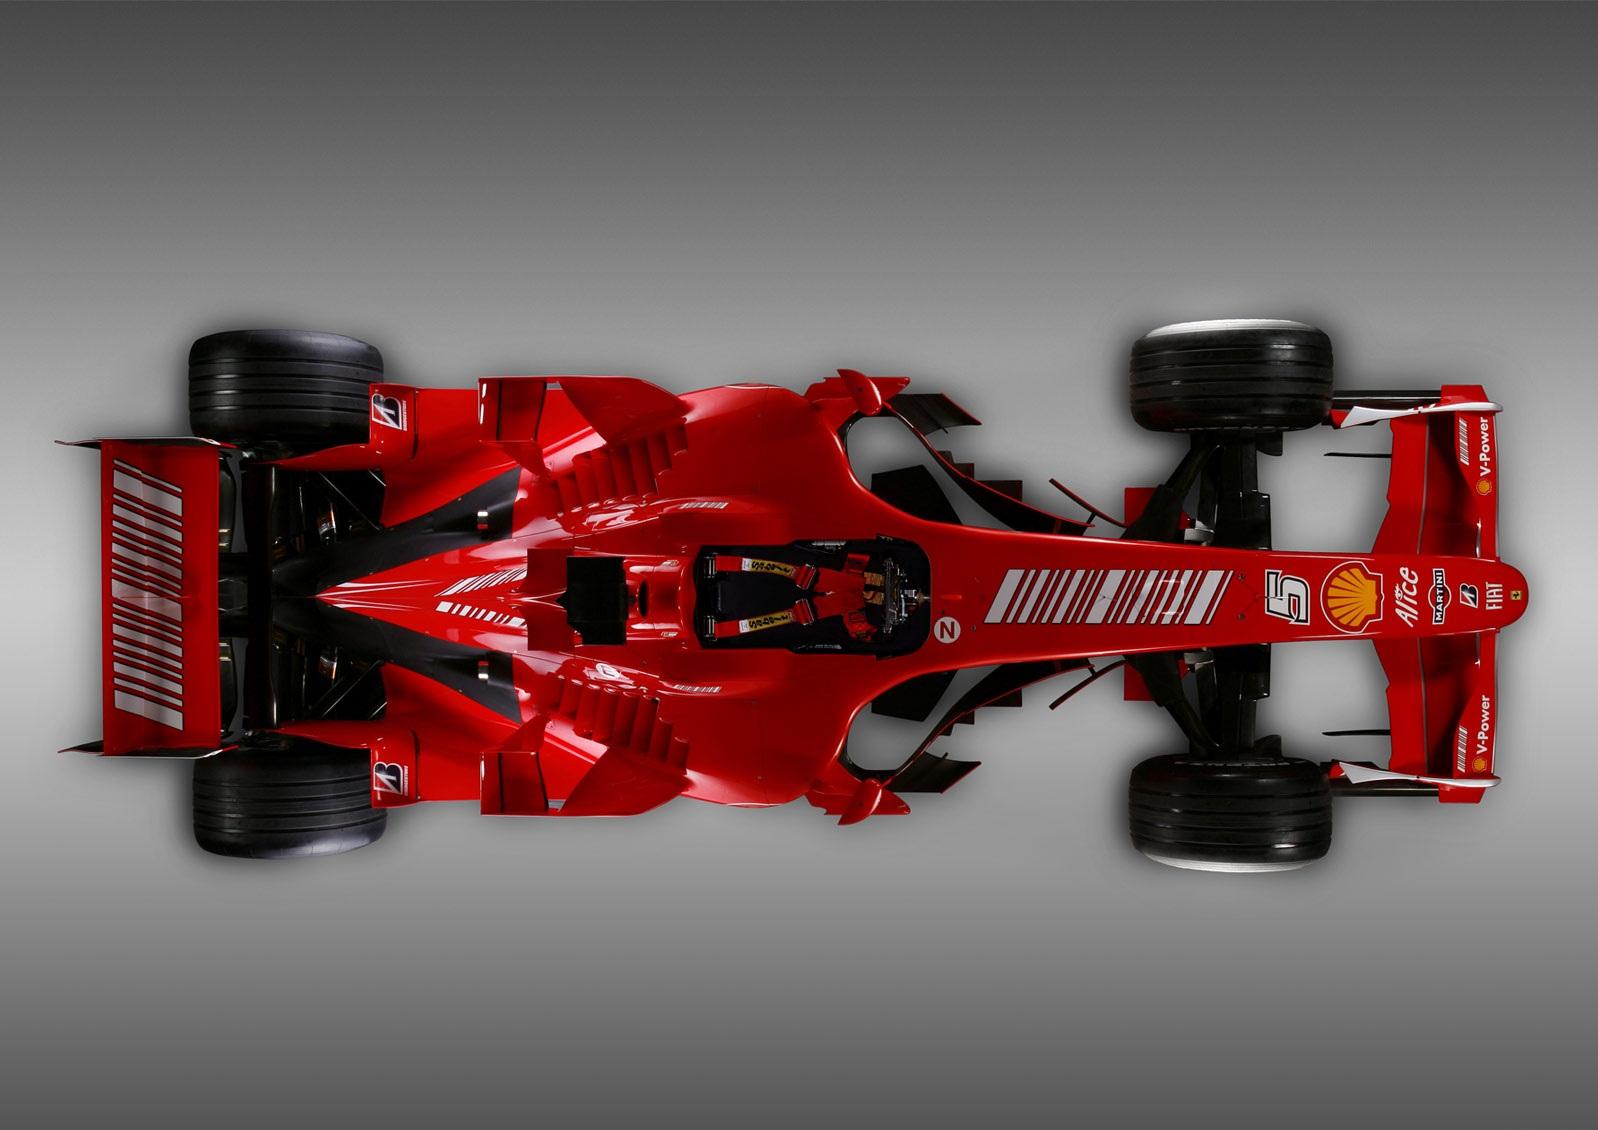 http://4.bp.blogspot.com/-n65MFwAK-Do/TcaVcPqv7oI/AAAAAAAAAOg/opYrbw2nElY/s1600/Ferrari_612_241_1600x1200.jpg